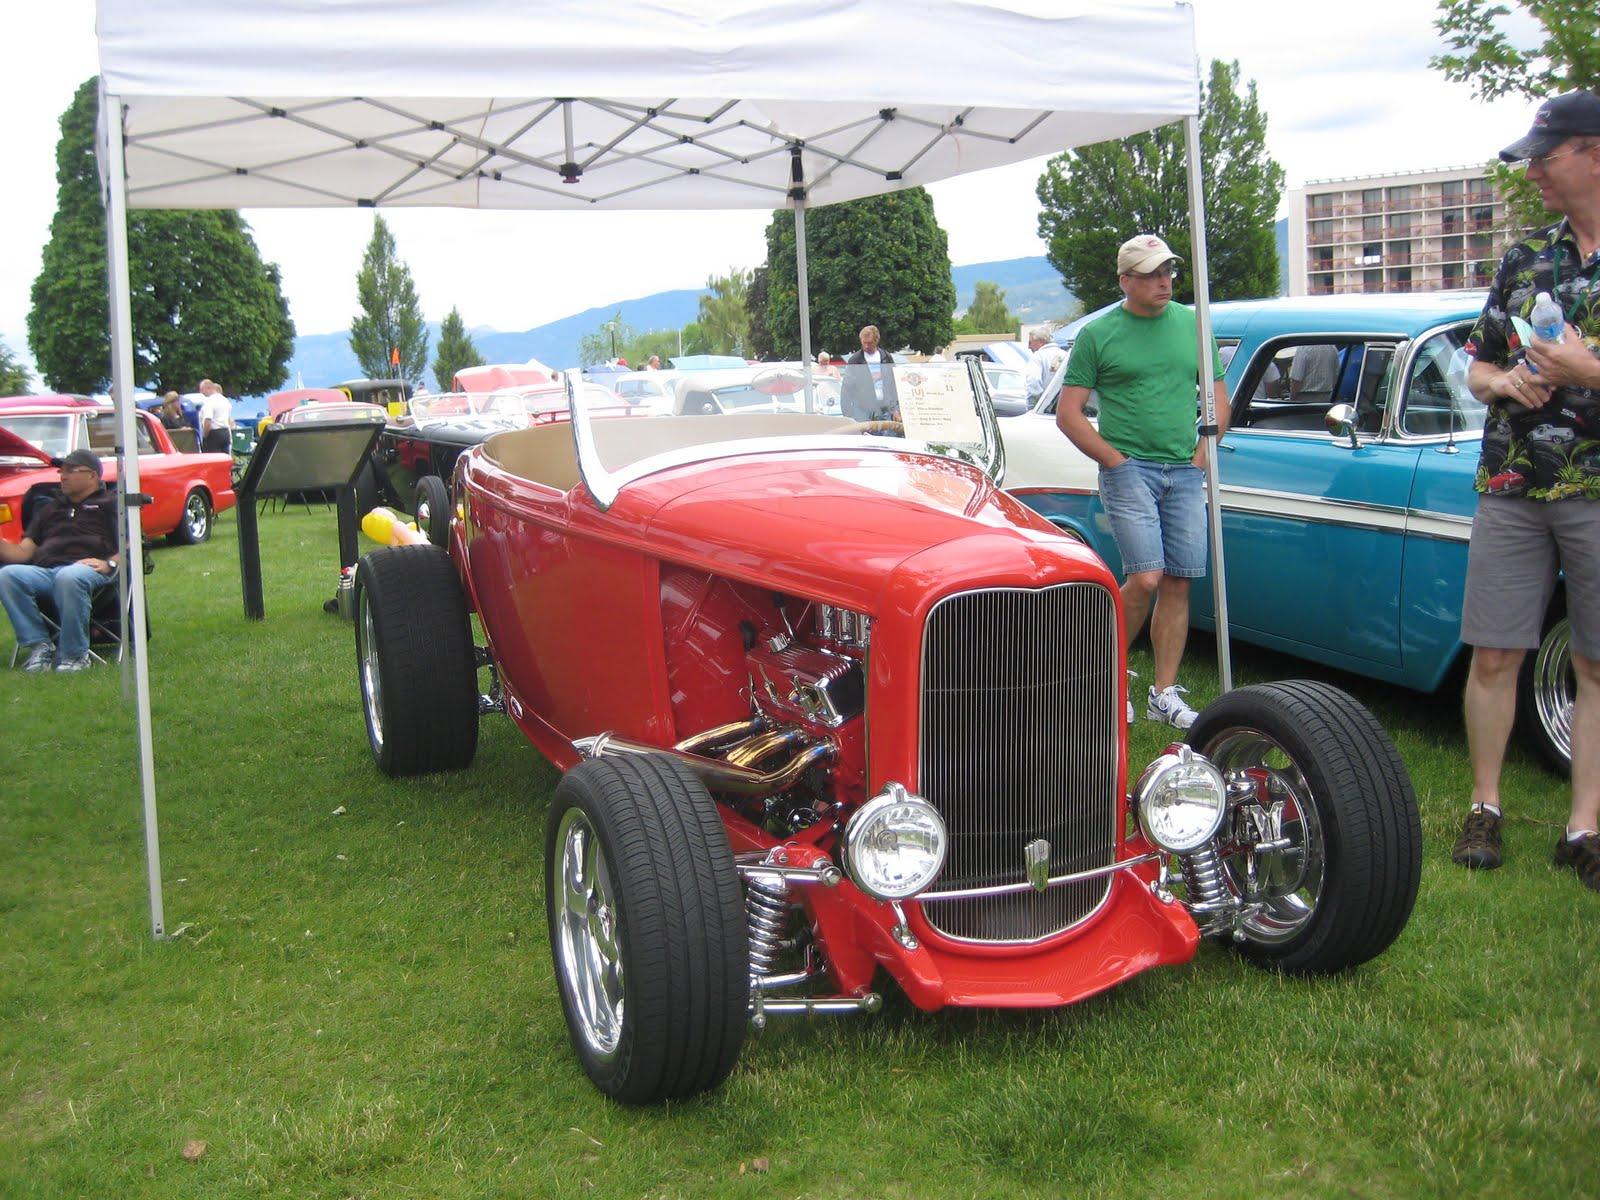 Okanagan Vacation Guide: Penticton Car Show Shines - Peach City ...